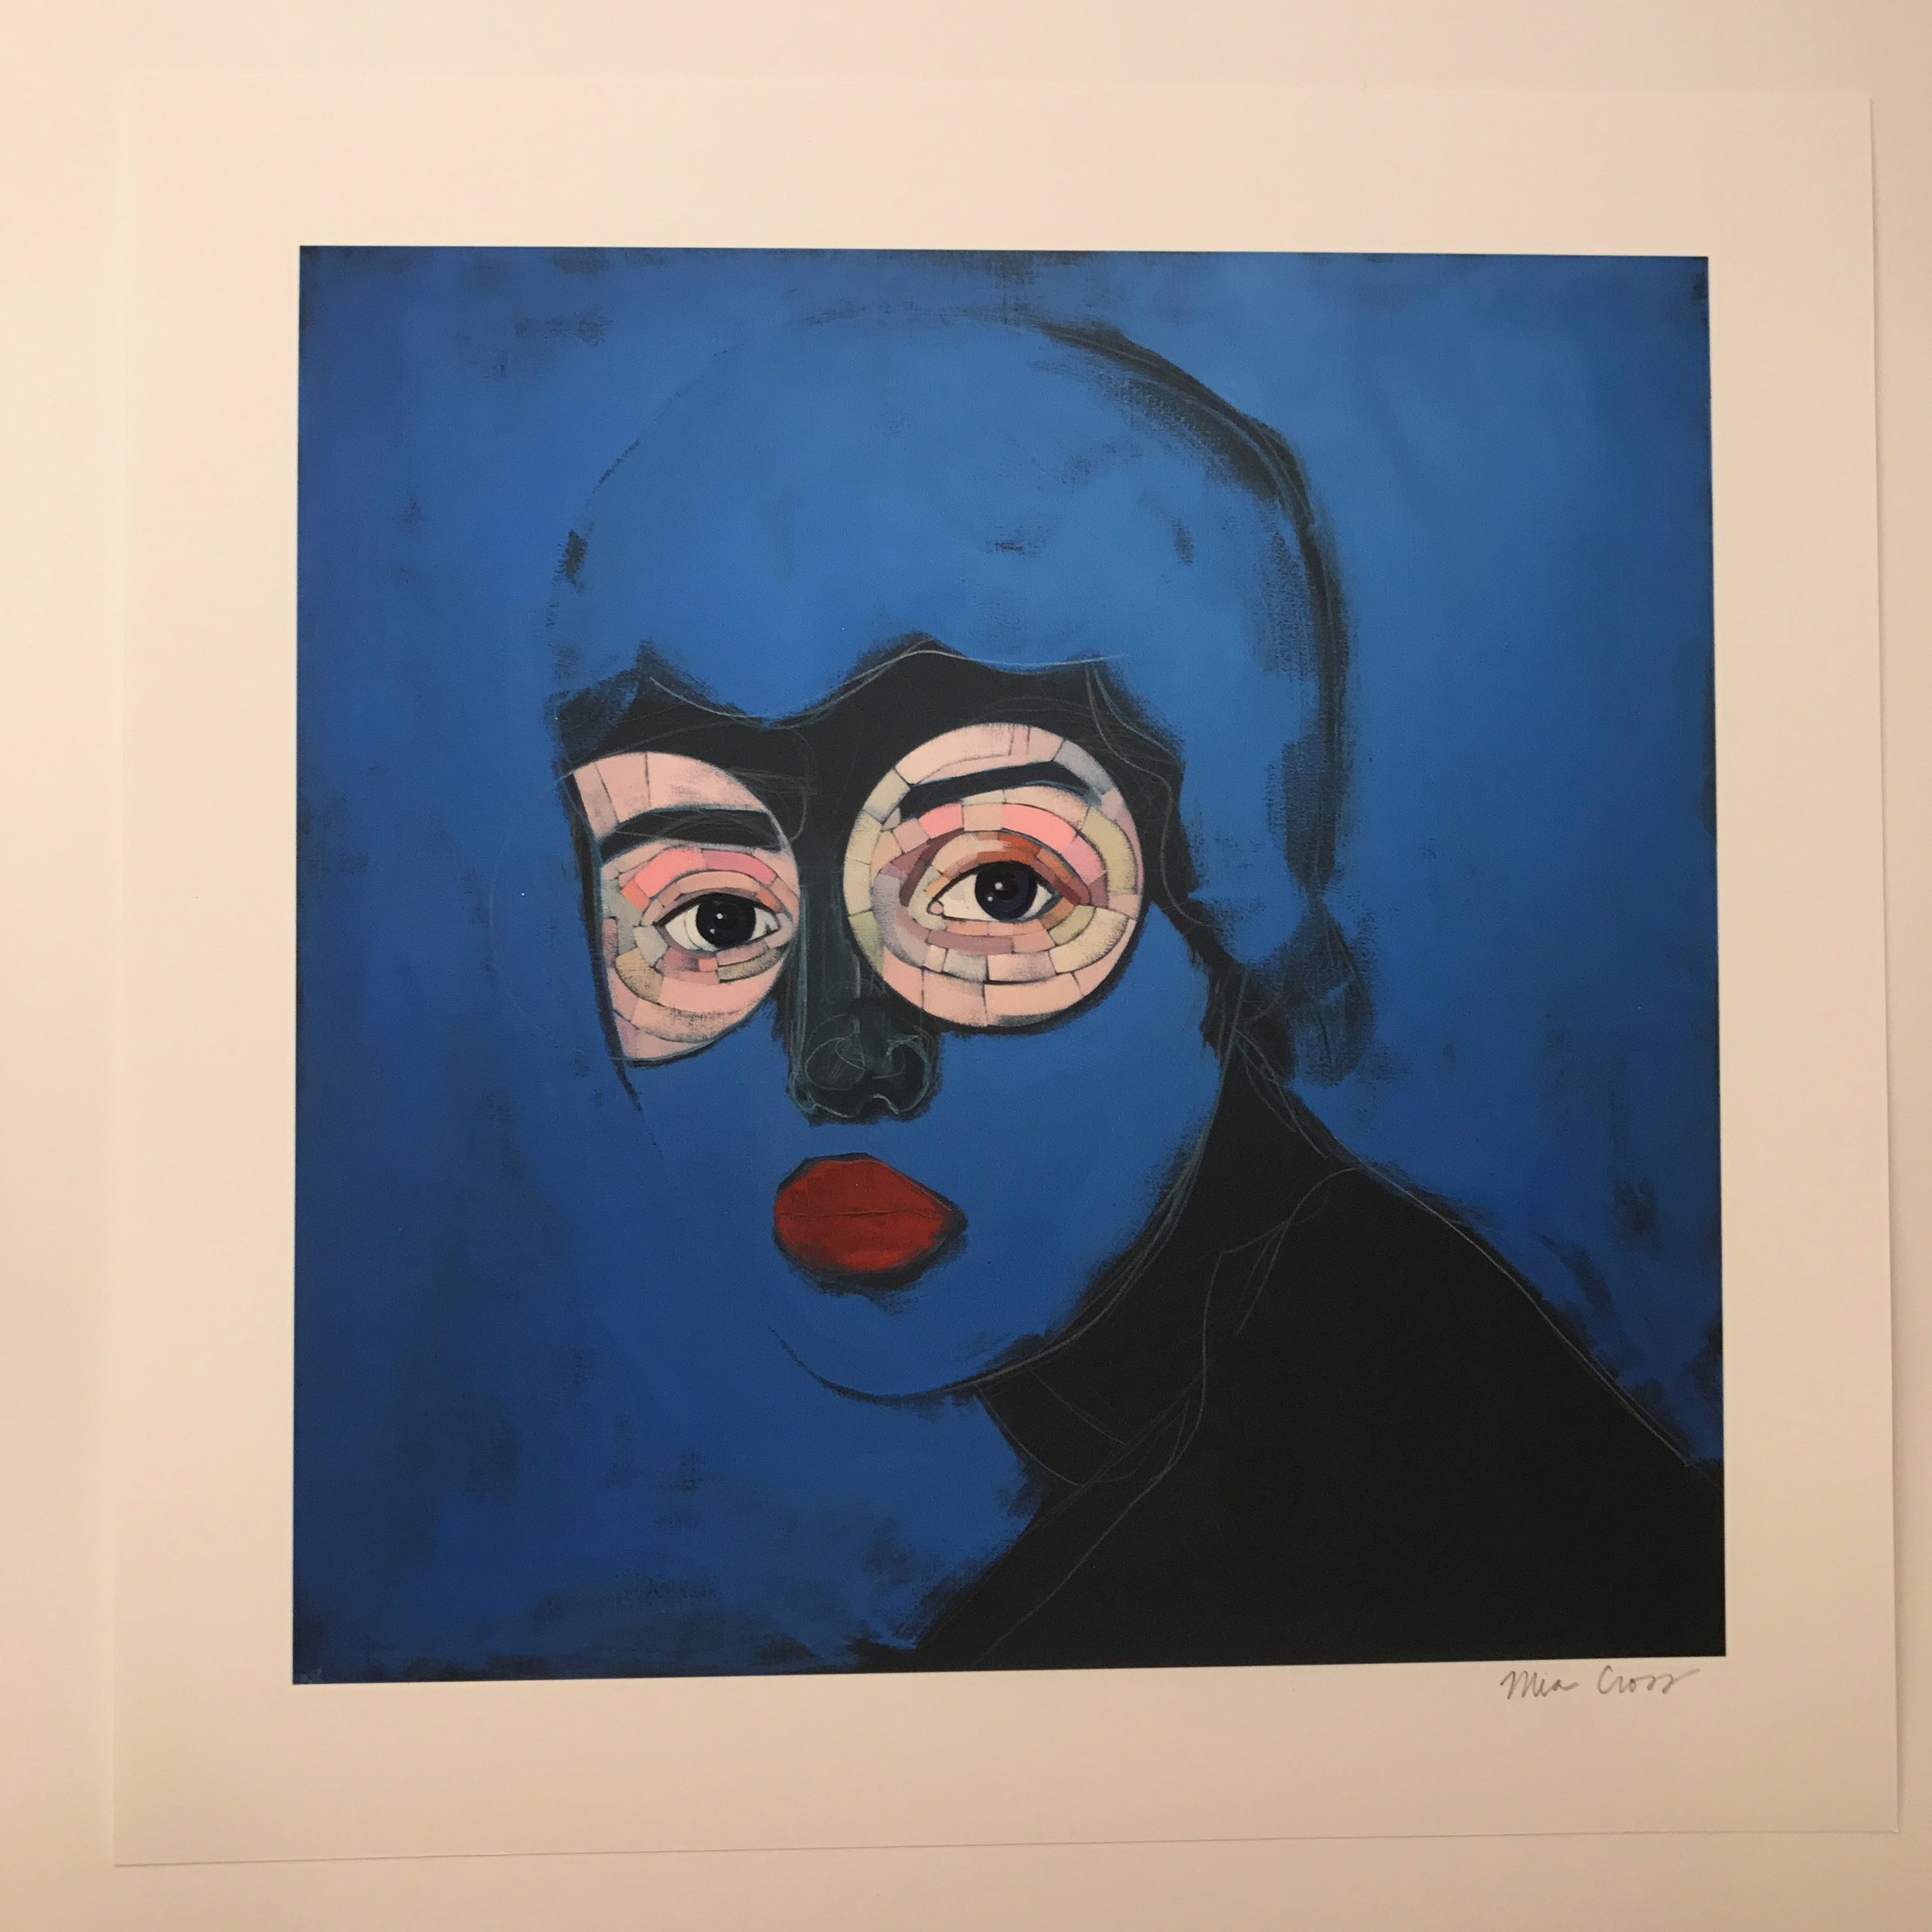 Blue baby  by Mia Cross